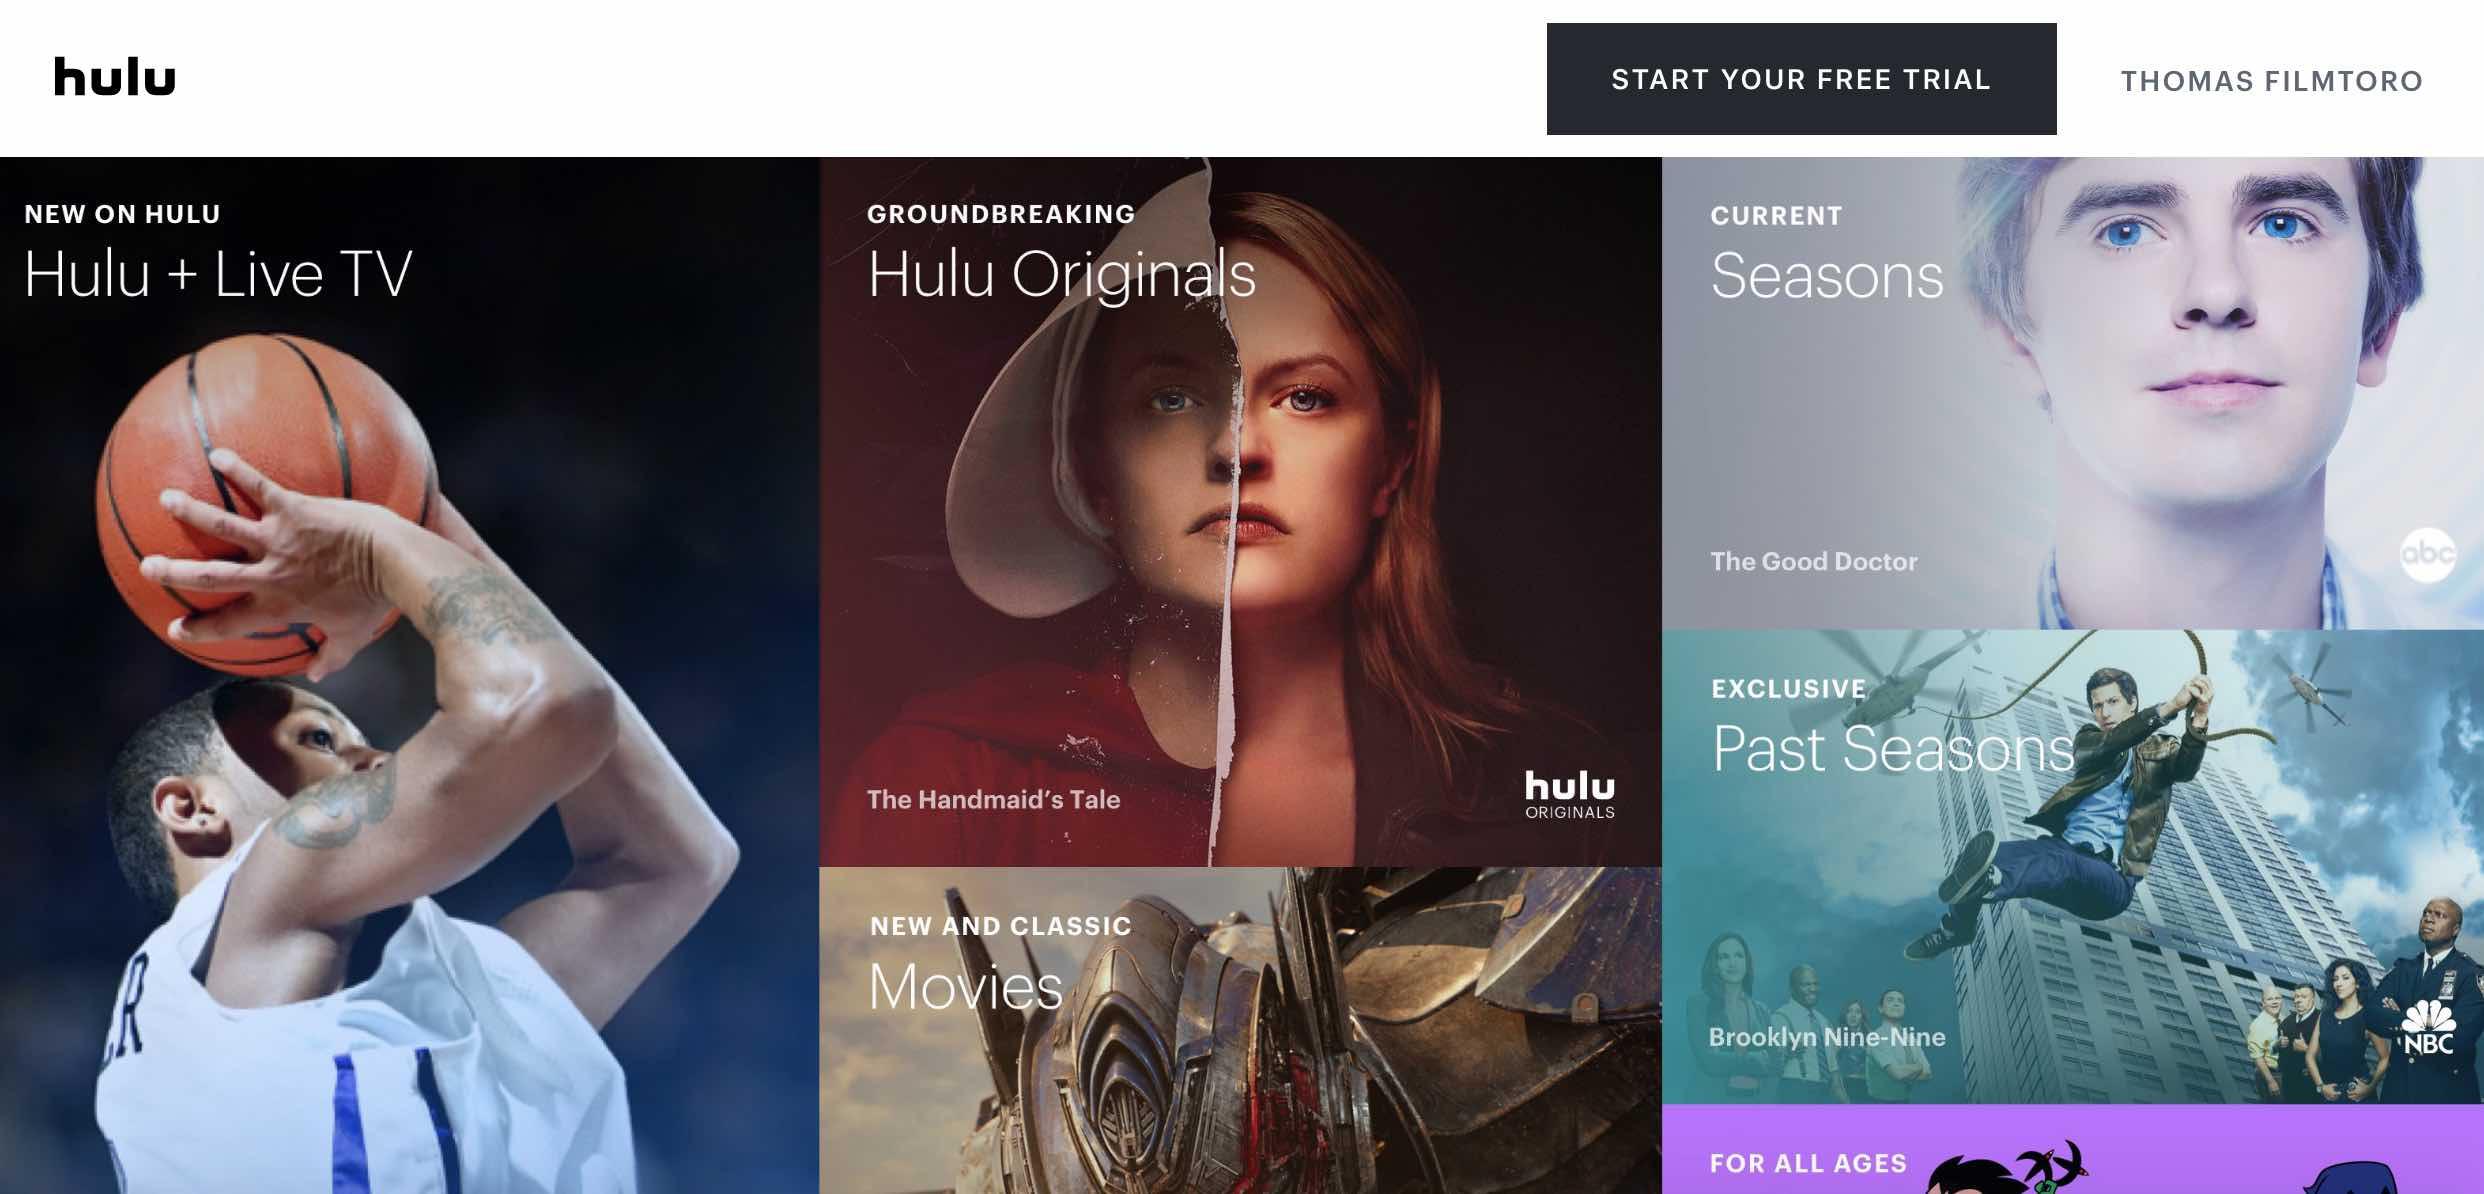 Bude Hulu dostupné i u nás?